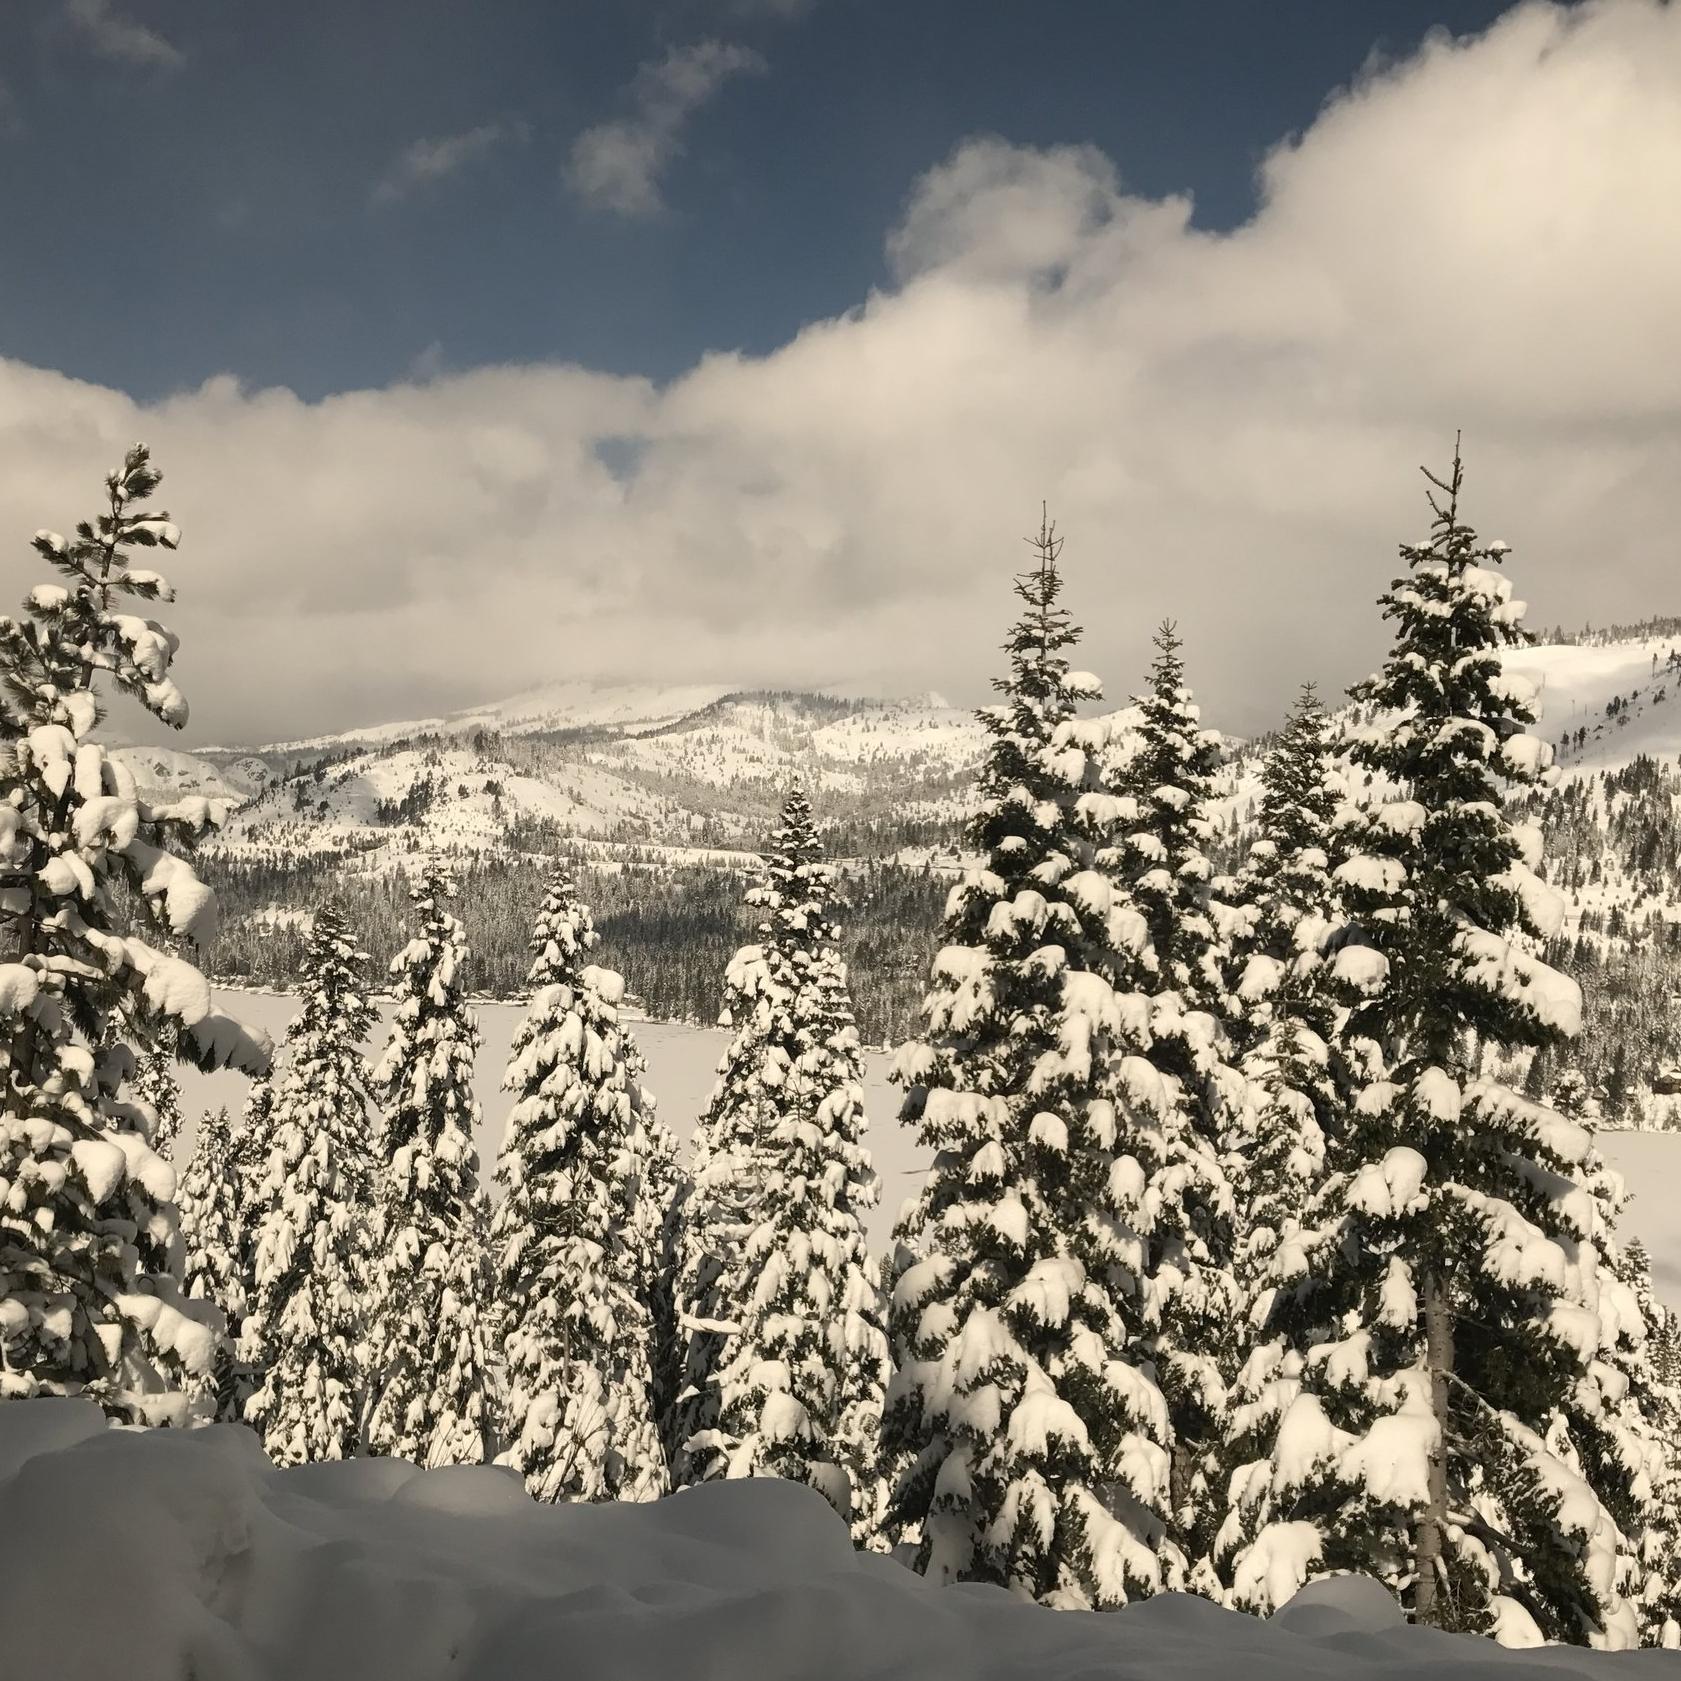 Going through the Sierra Nevadas.